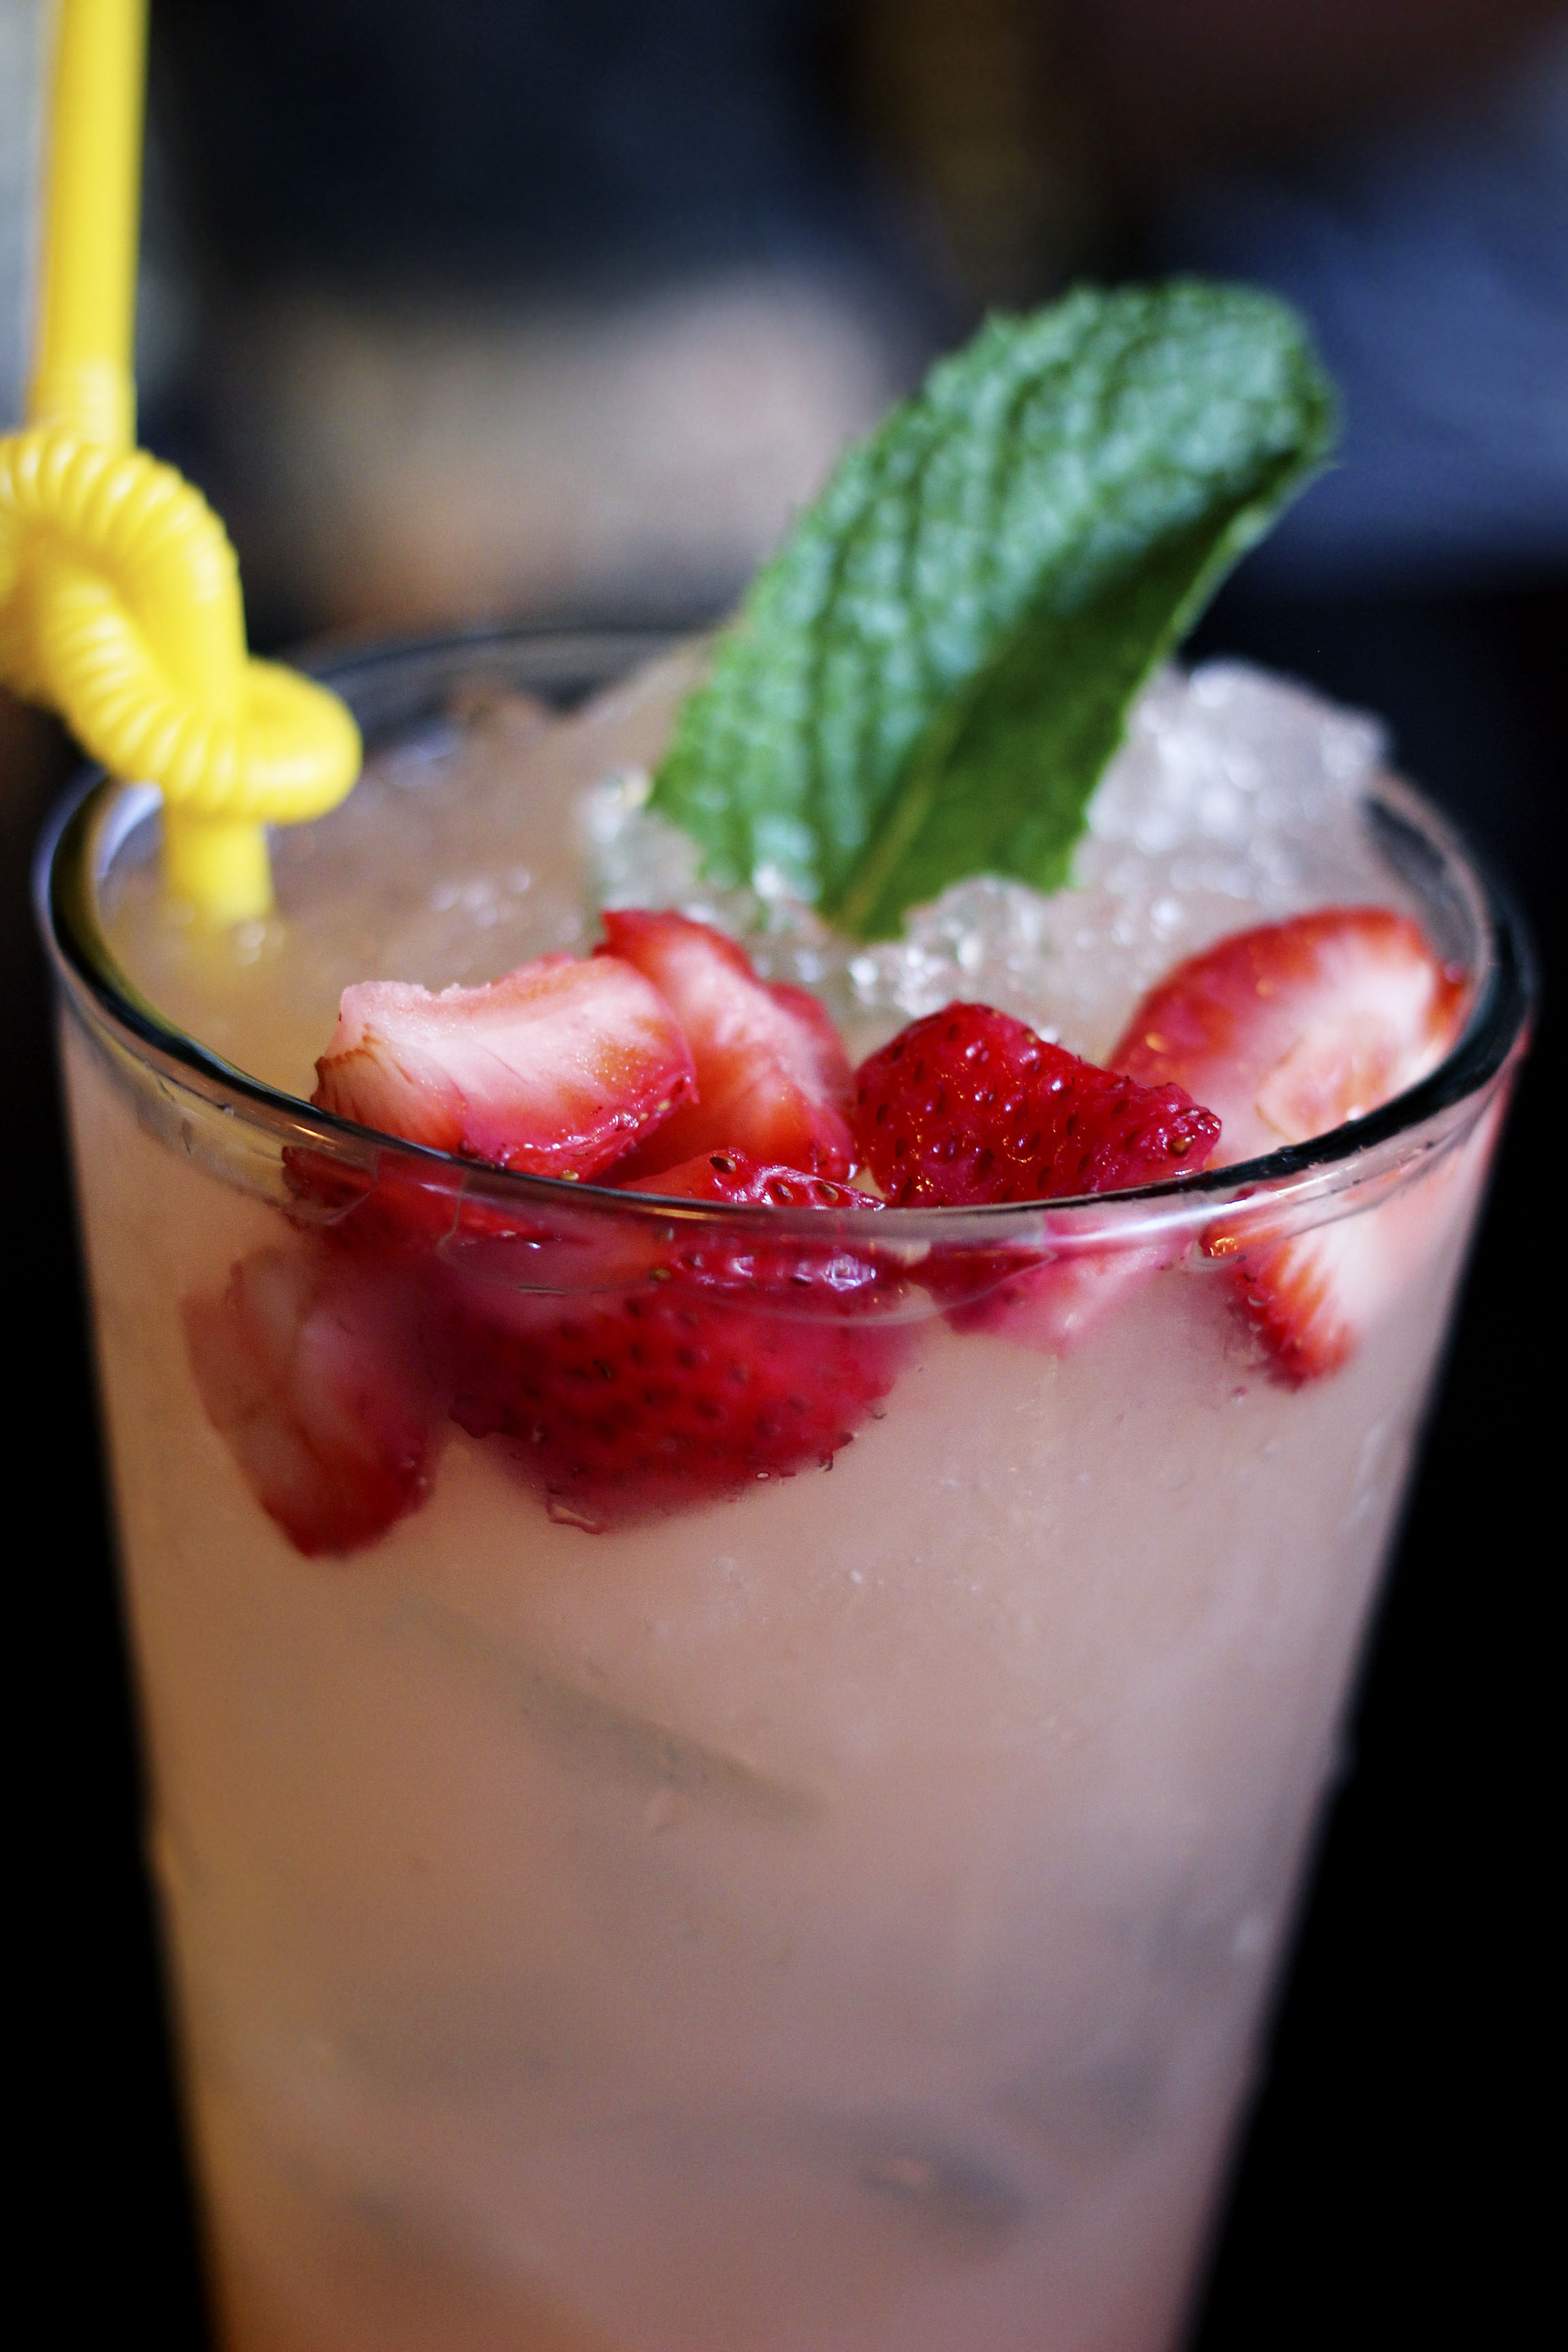 Tall glass of strawberry lemonade.